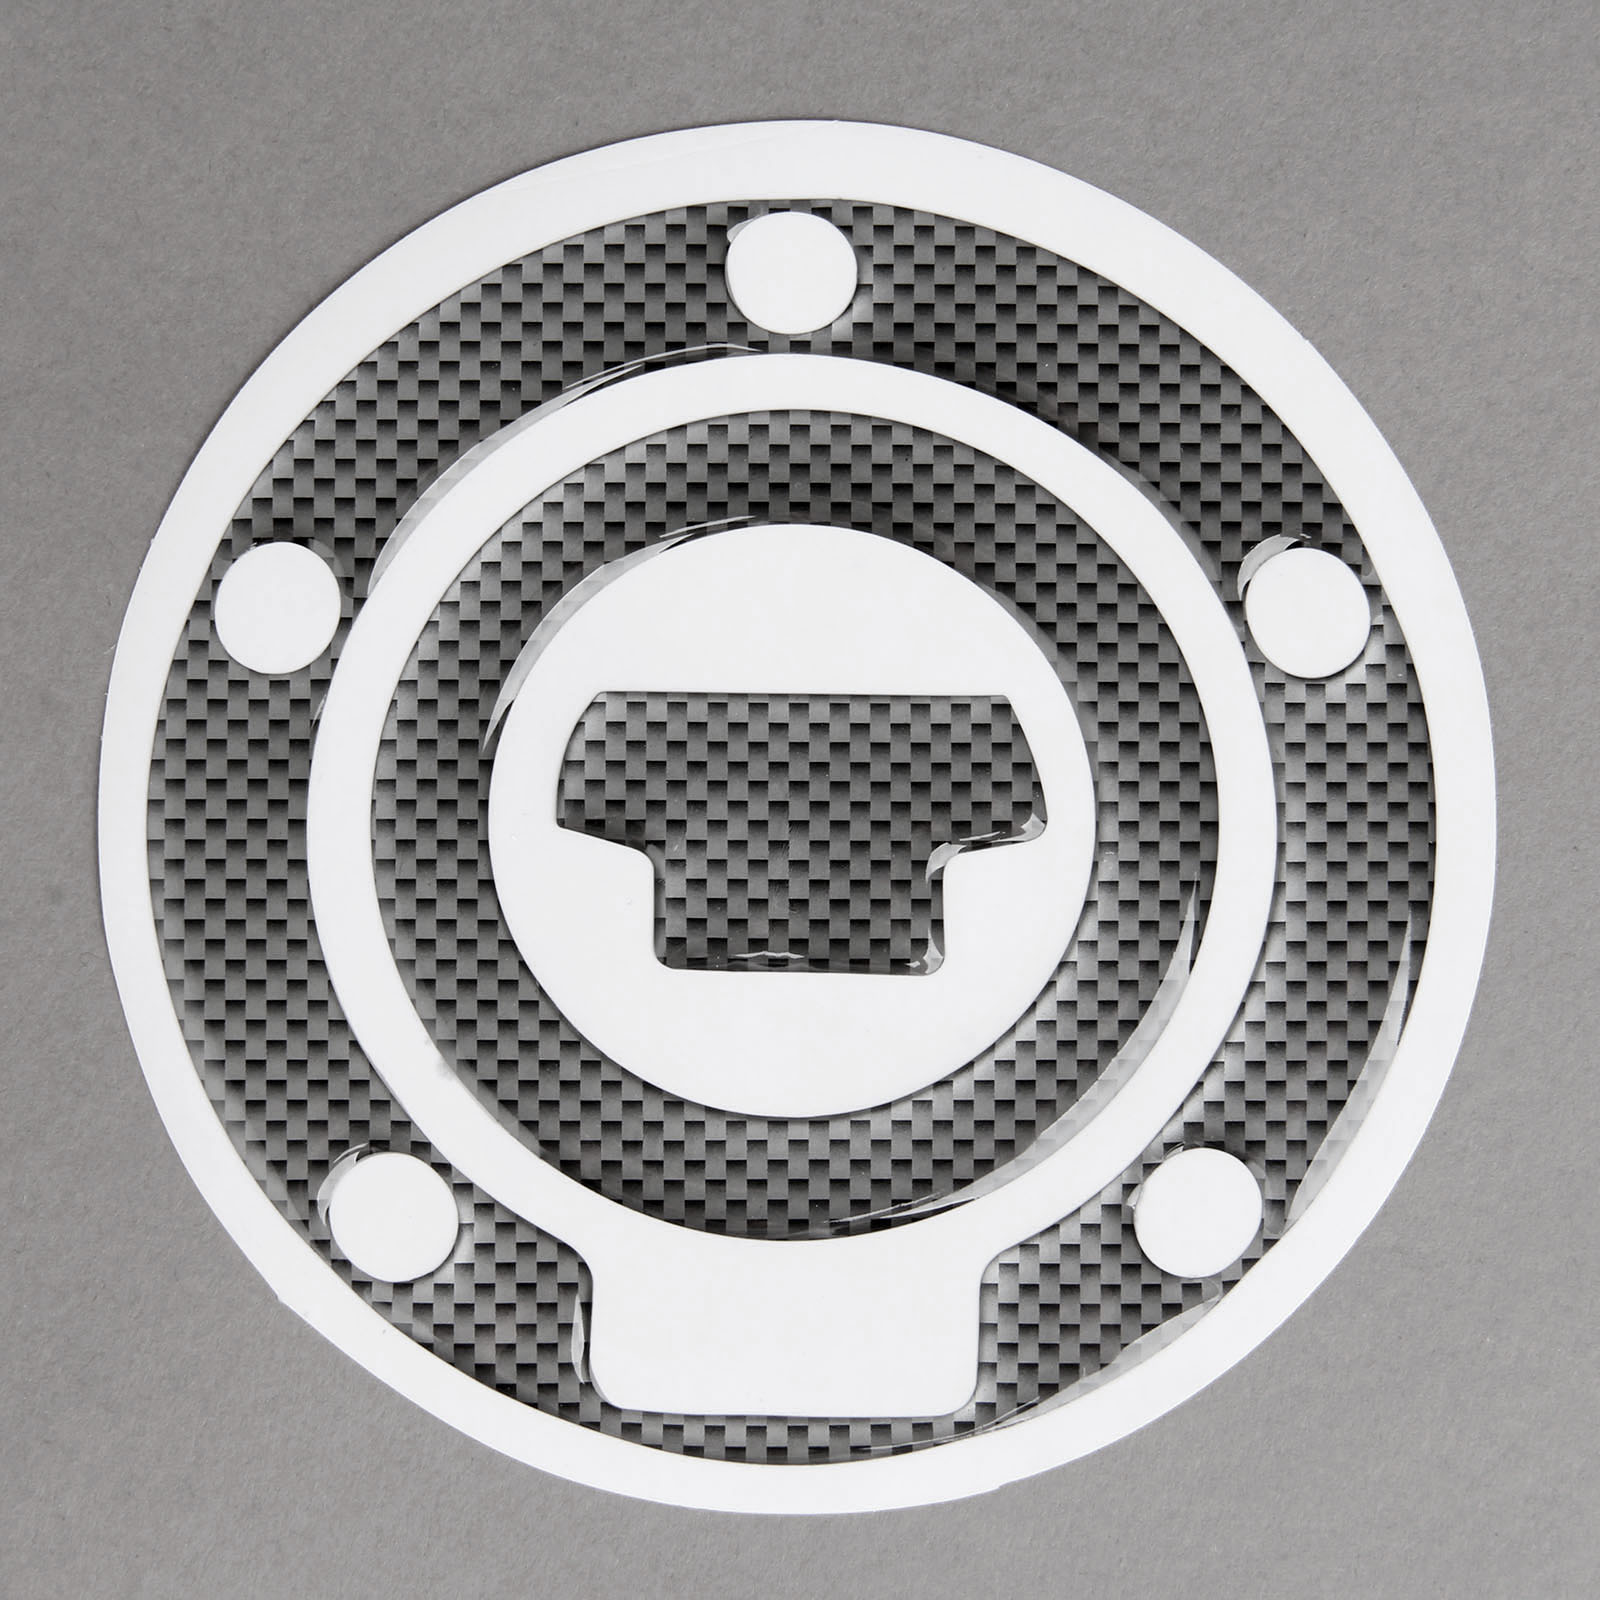 1Pcs Motorcycle Sticker Fuel Gas Cap Cover Pad Sticker Car Decal Protector For Yamaha YAMAHA R1 R6 FZ-1 FJR1300 FZ6 FZ8 FZ1 XJ6